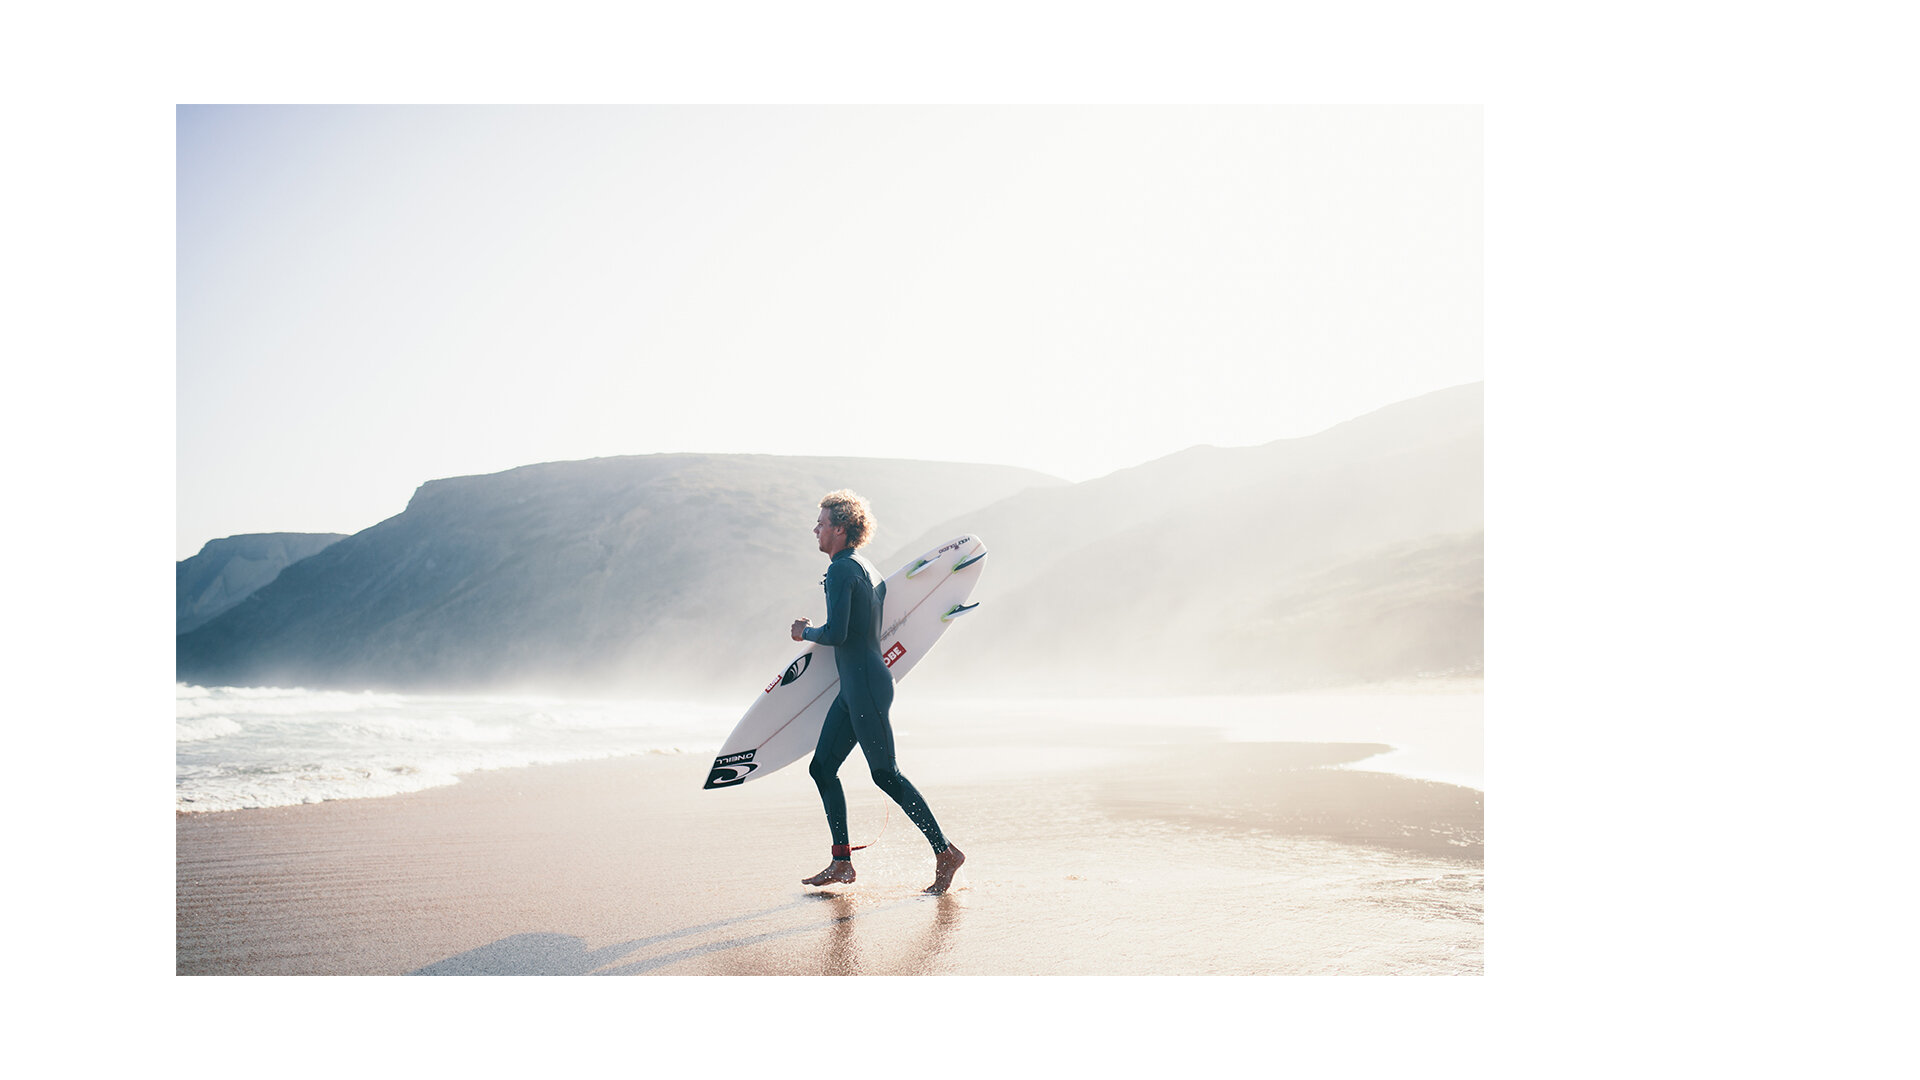 toby-butler-tobybutlerphoto-surf-surfing-waterphotography-ocean-Oneill-wetsuits-swimwear-girl-bikini-clothing-surf-portugal-lifestylephotography-9.jpg